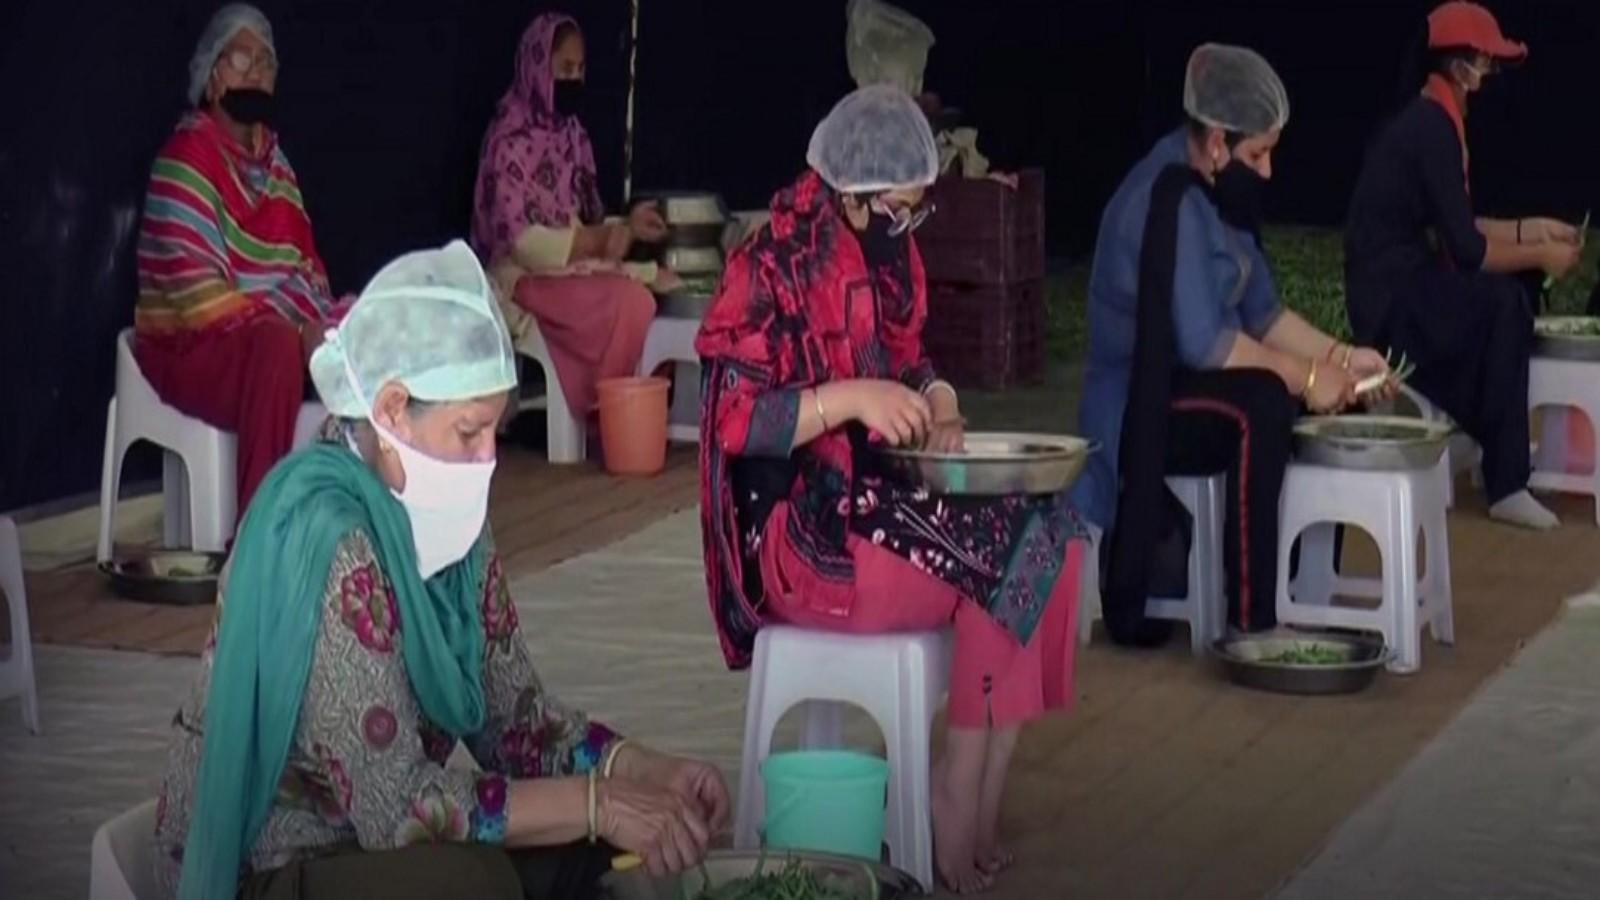 covid-19-crisis-radha-soami-satsang-beas-prepares-food-for-12-lakh-people-per-day-across-india